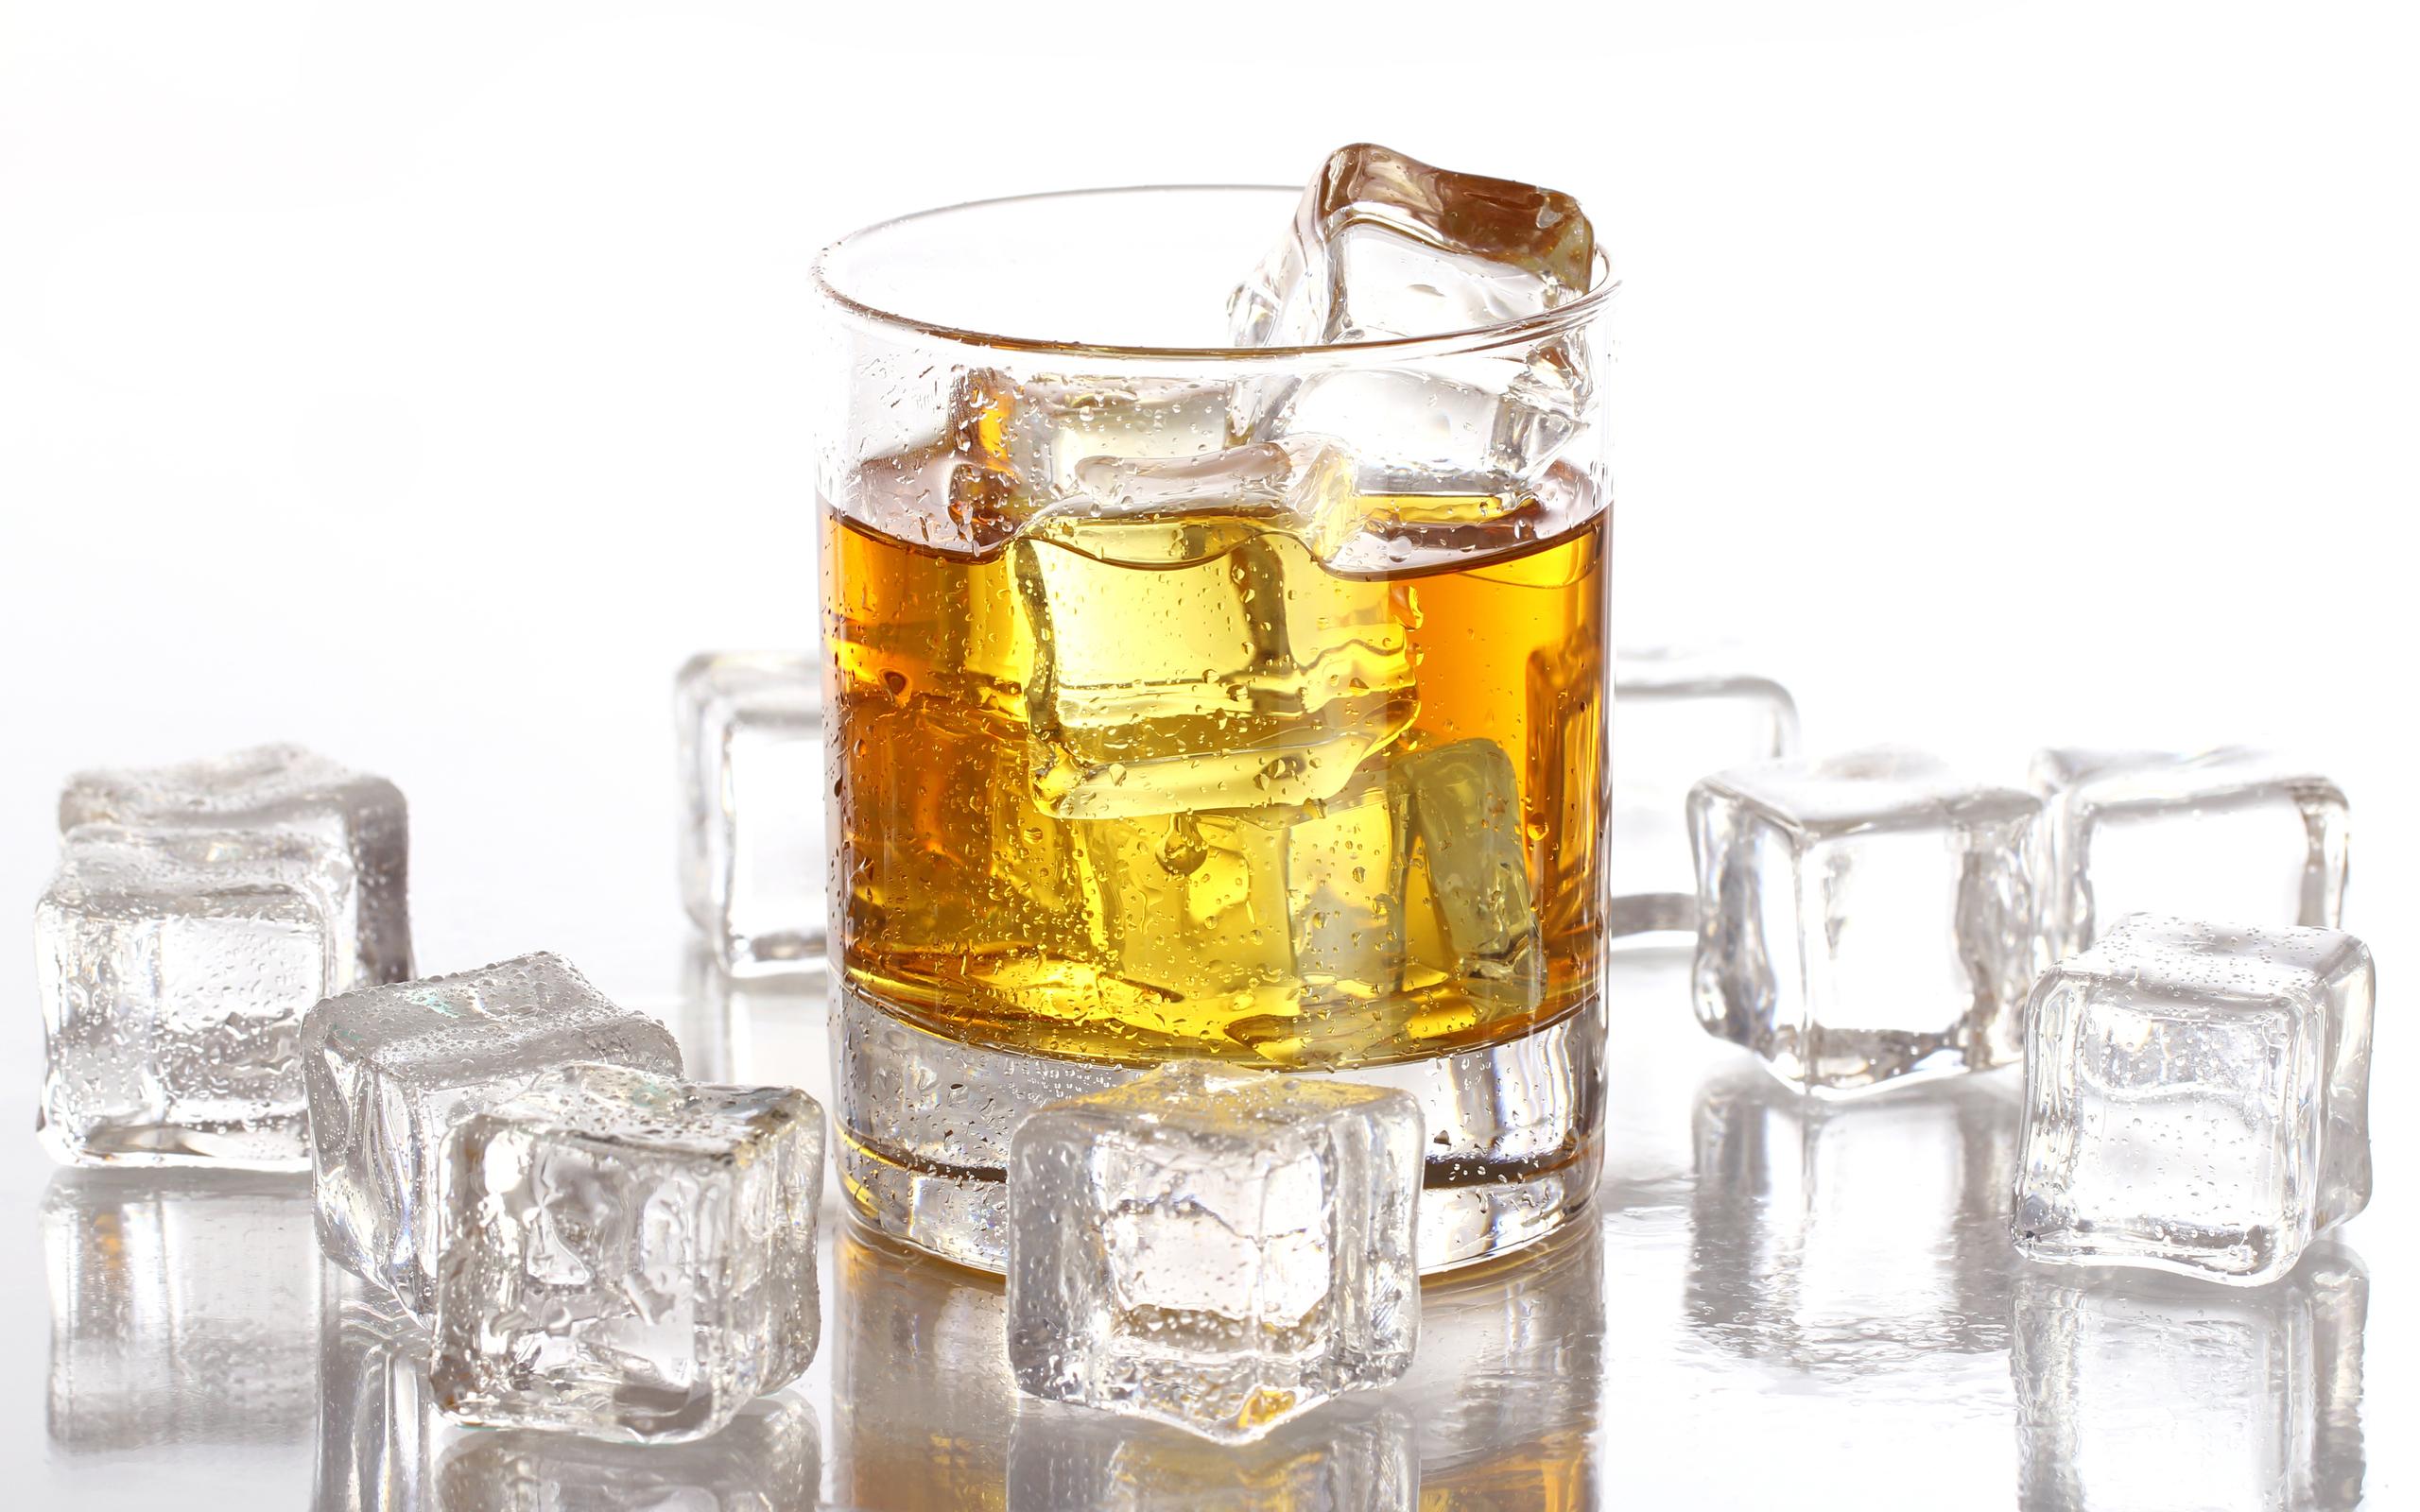 wallpaper whiskey bourbon alcohol - photo #40